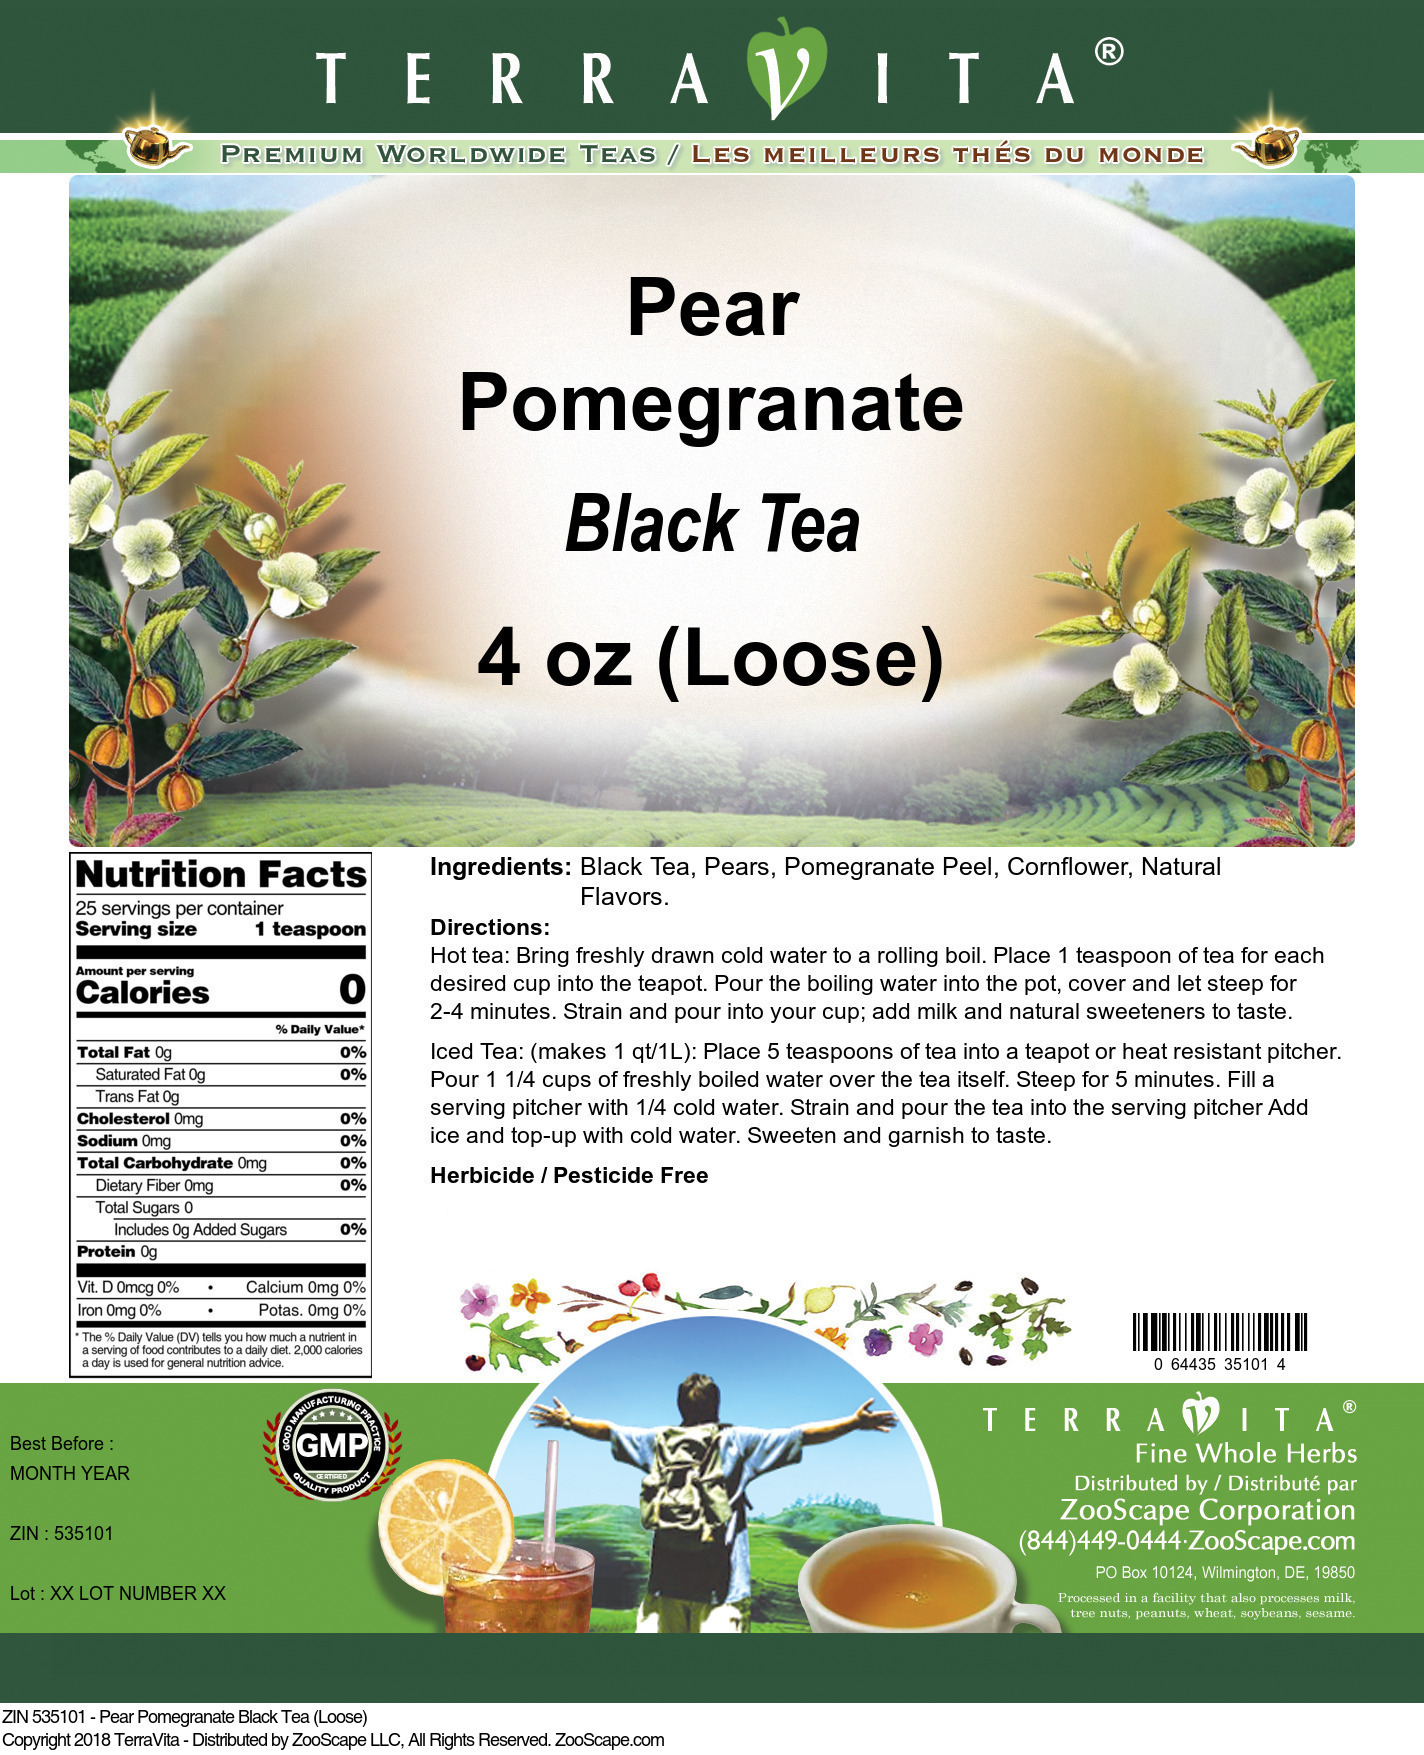 Pear Pomegranate Black Tea